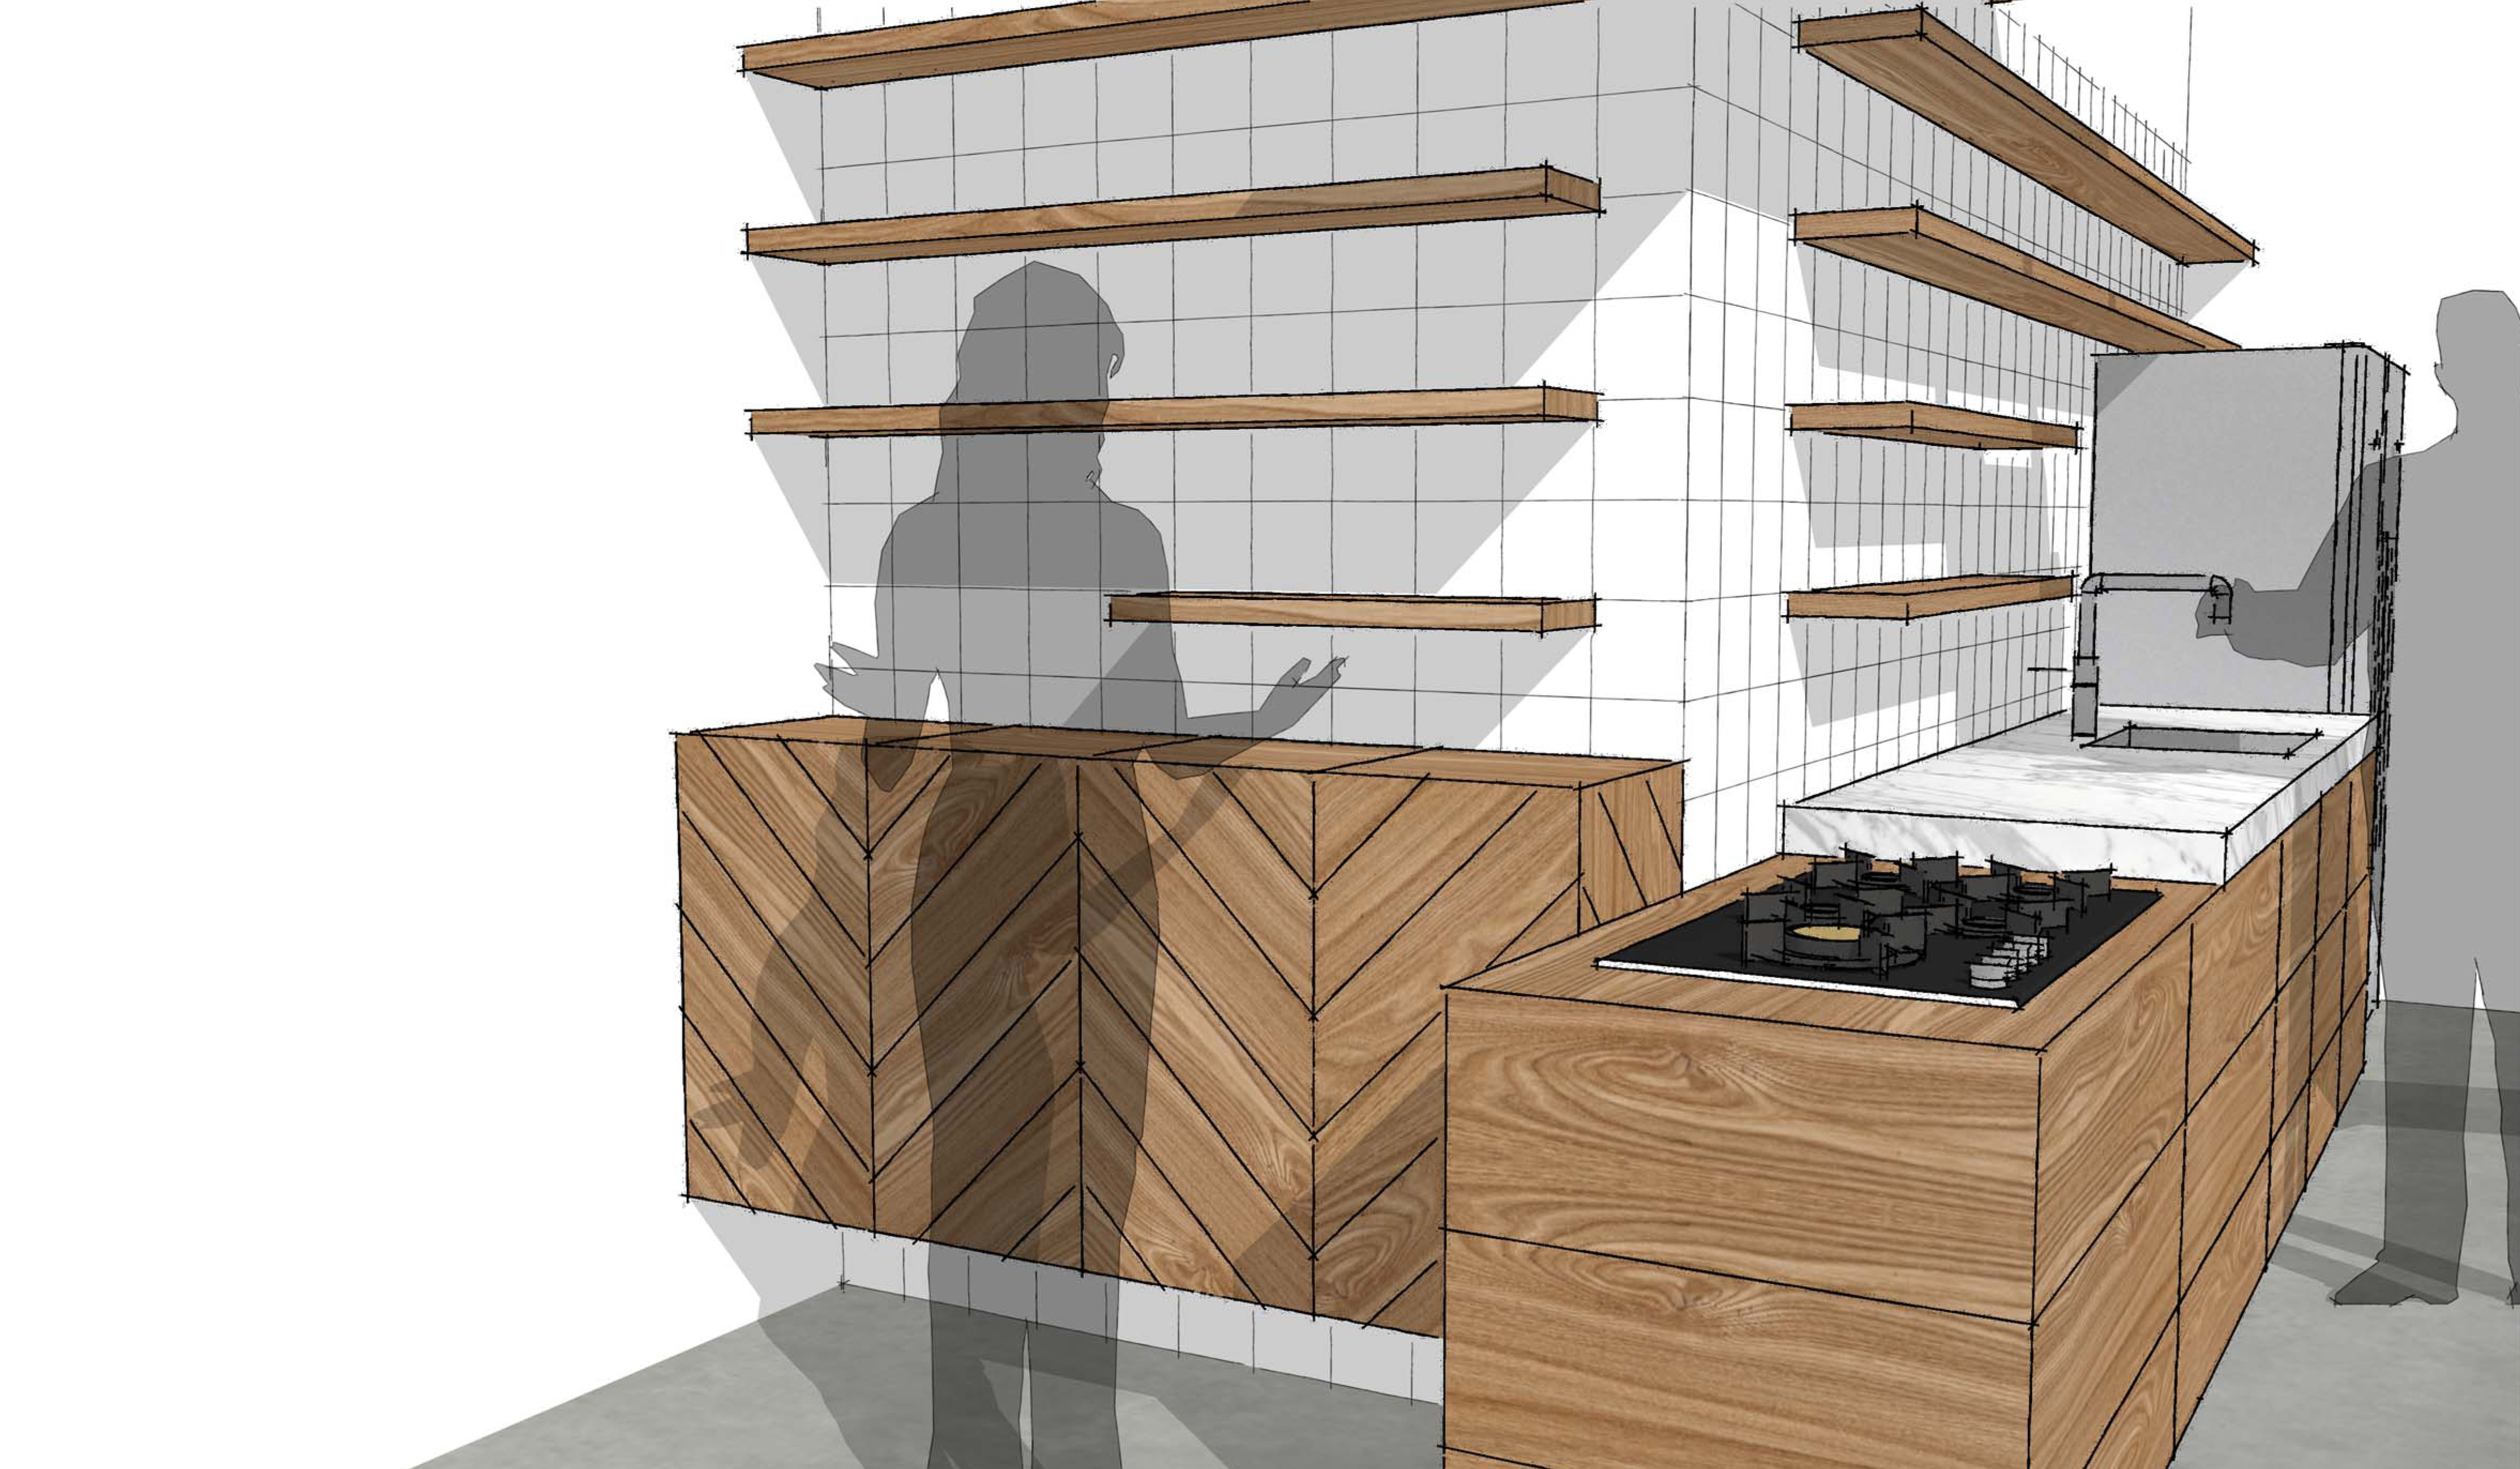 Houten keuken te breda studio sool meubels - Redo keuken houten ...